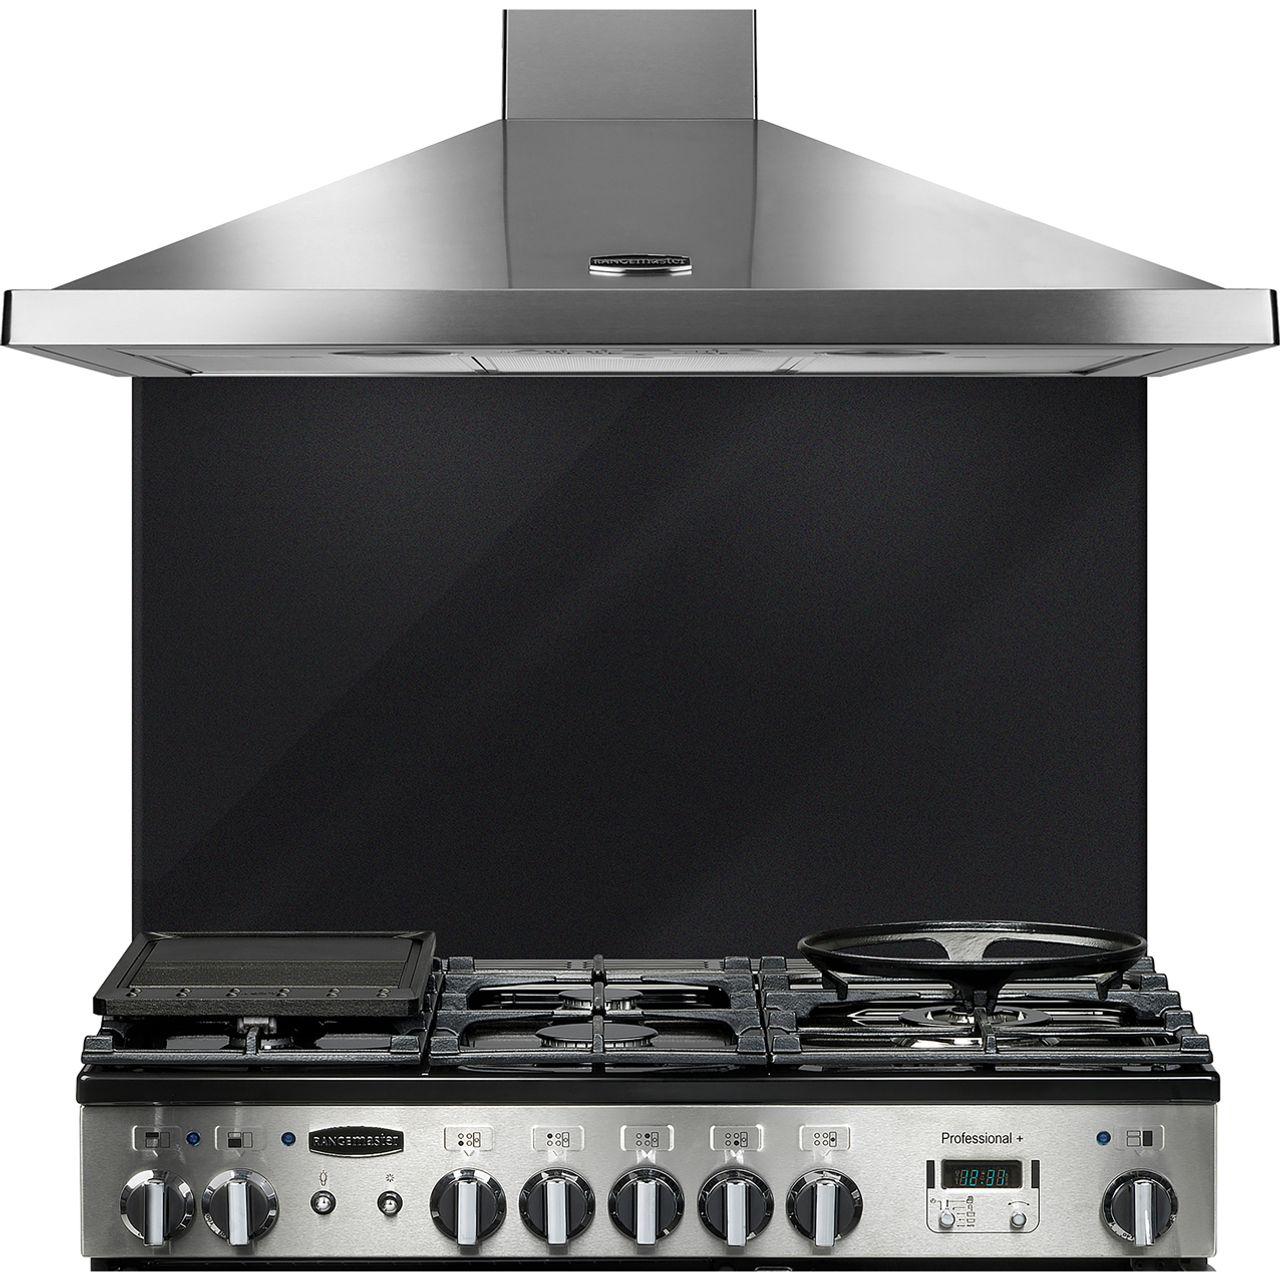 RANGEMASTER 90 110 Genuine Oven Cooker Range a levé Switch Knob Black Gold x 6